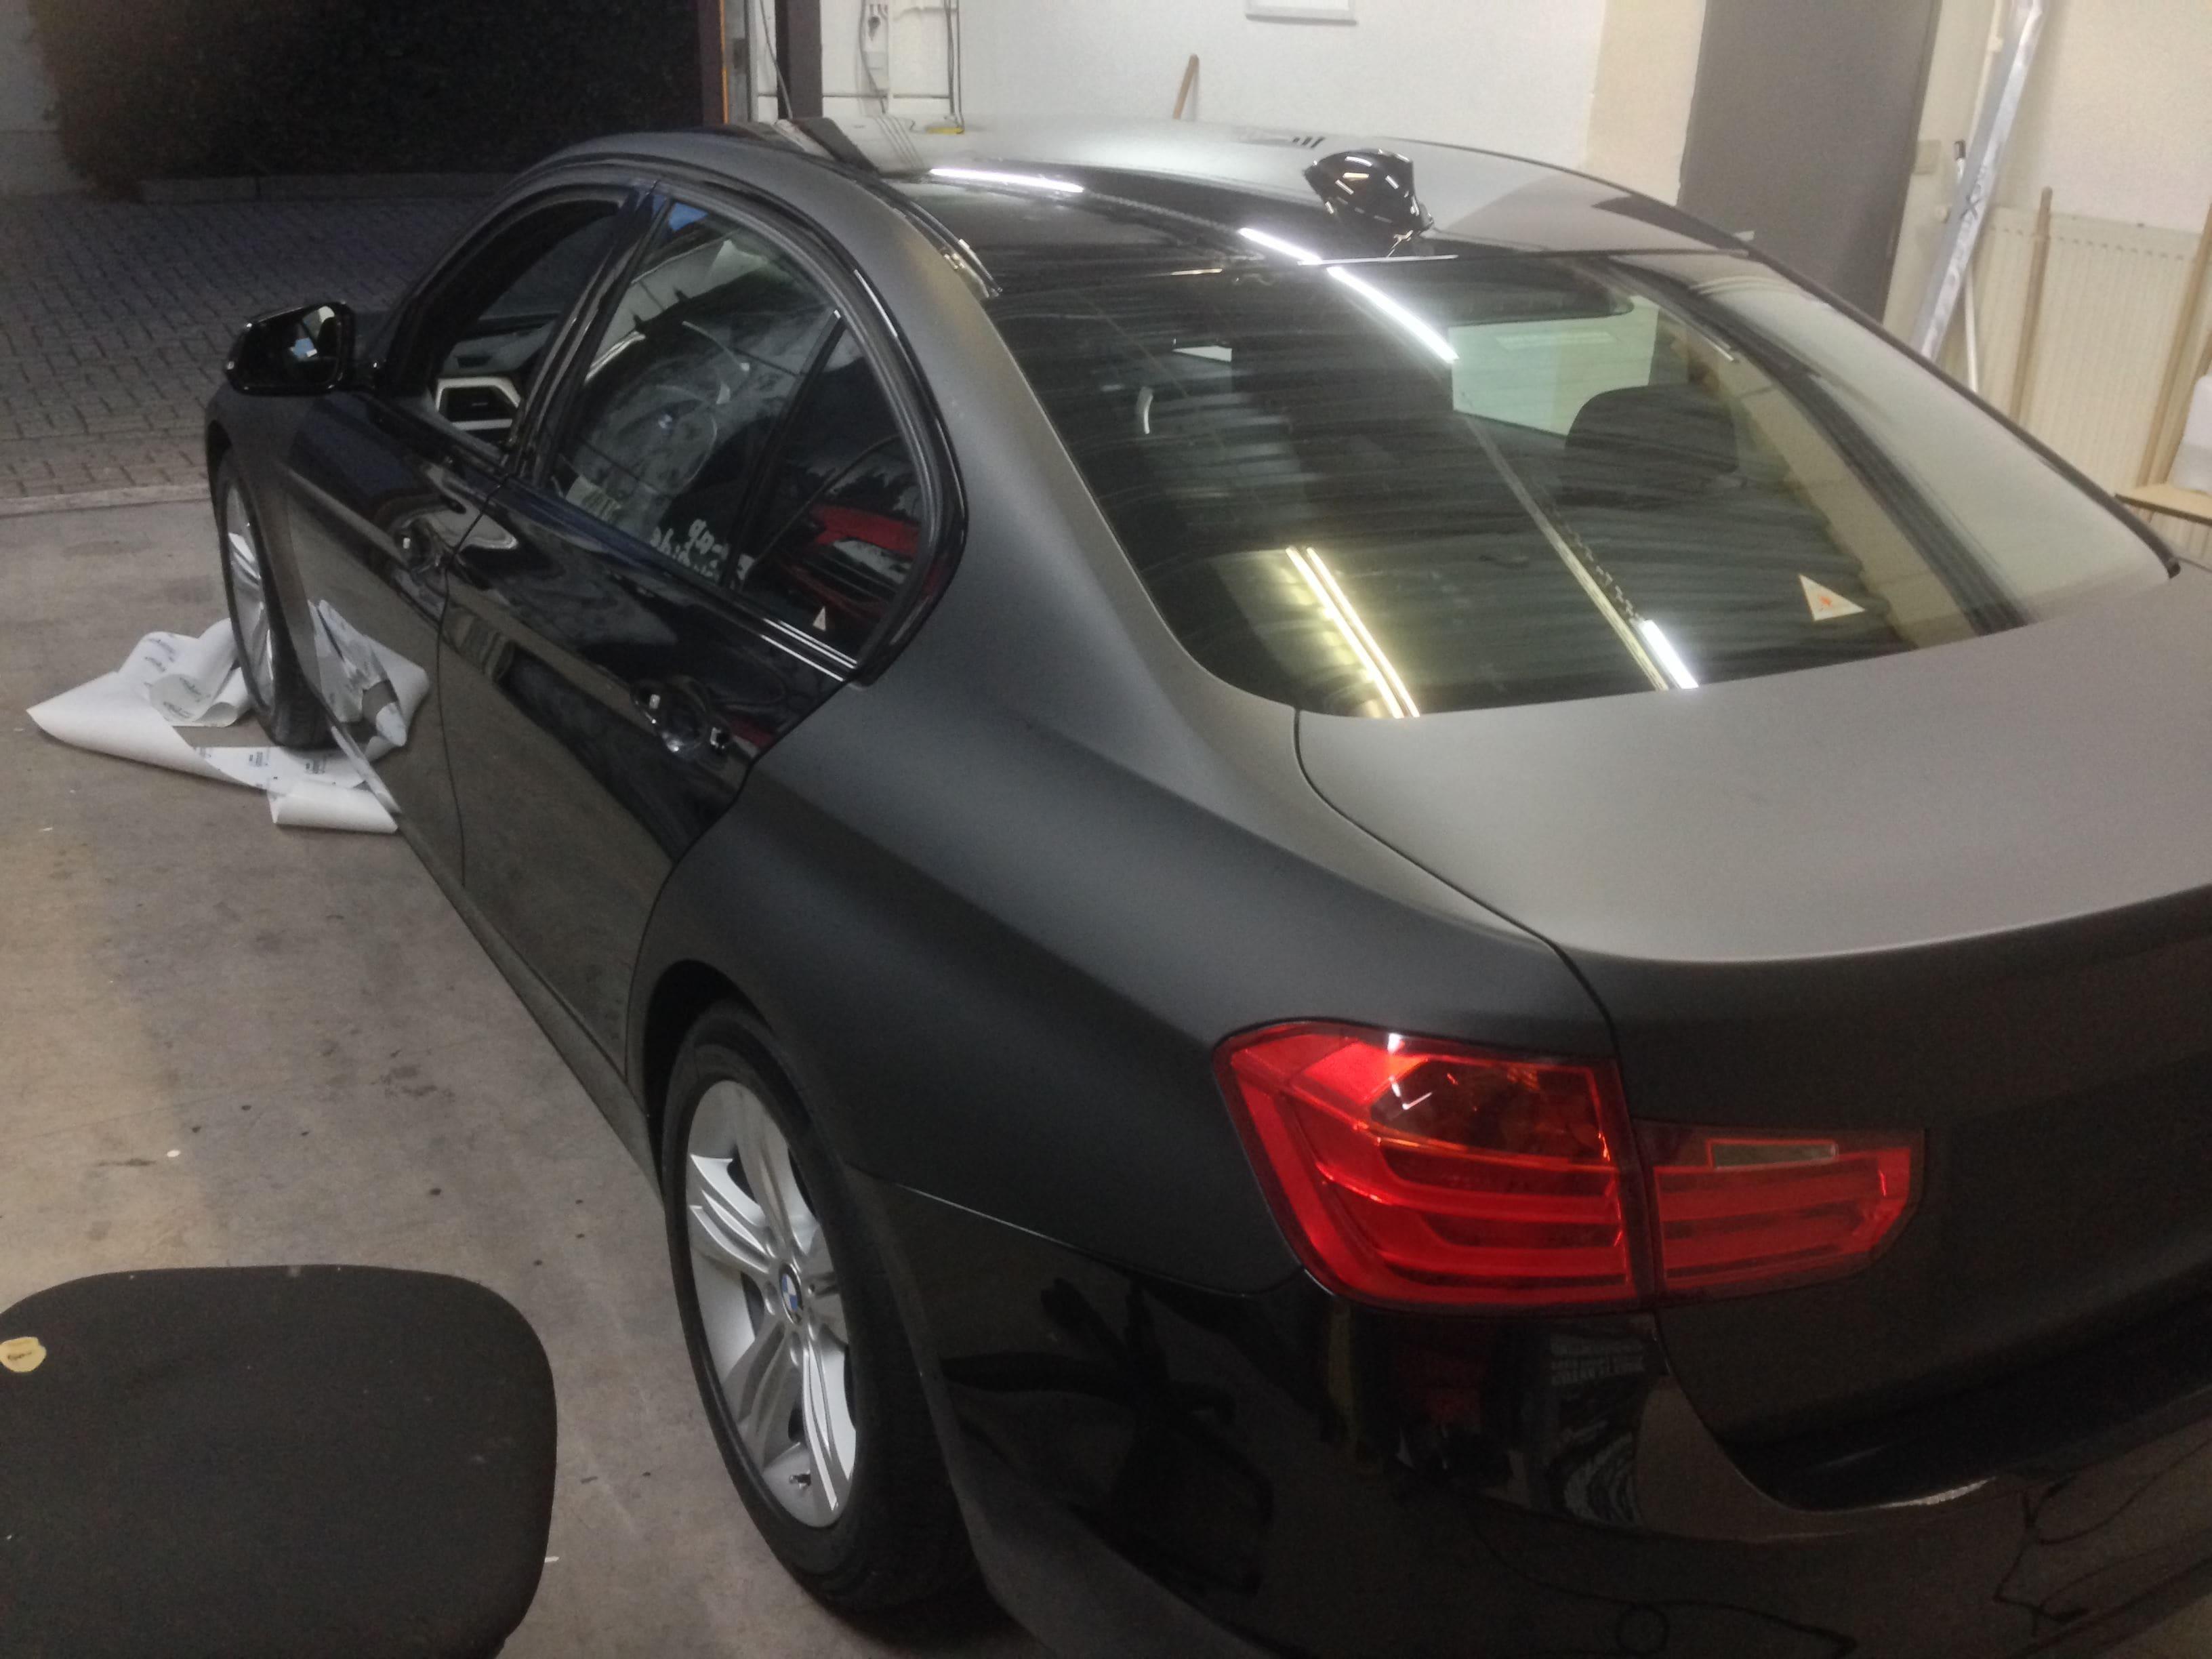 BMW E92 3 Serie met Mat Zwarte Wrap, Carwrapping door Wrapmyride.nu Foto-nr:5407, ©2020